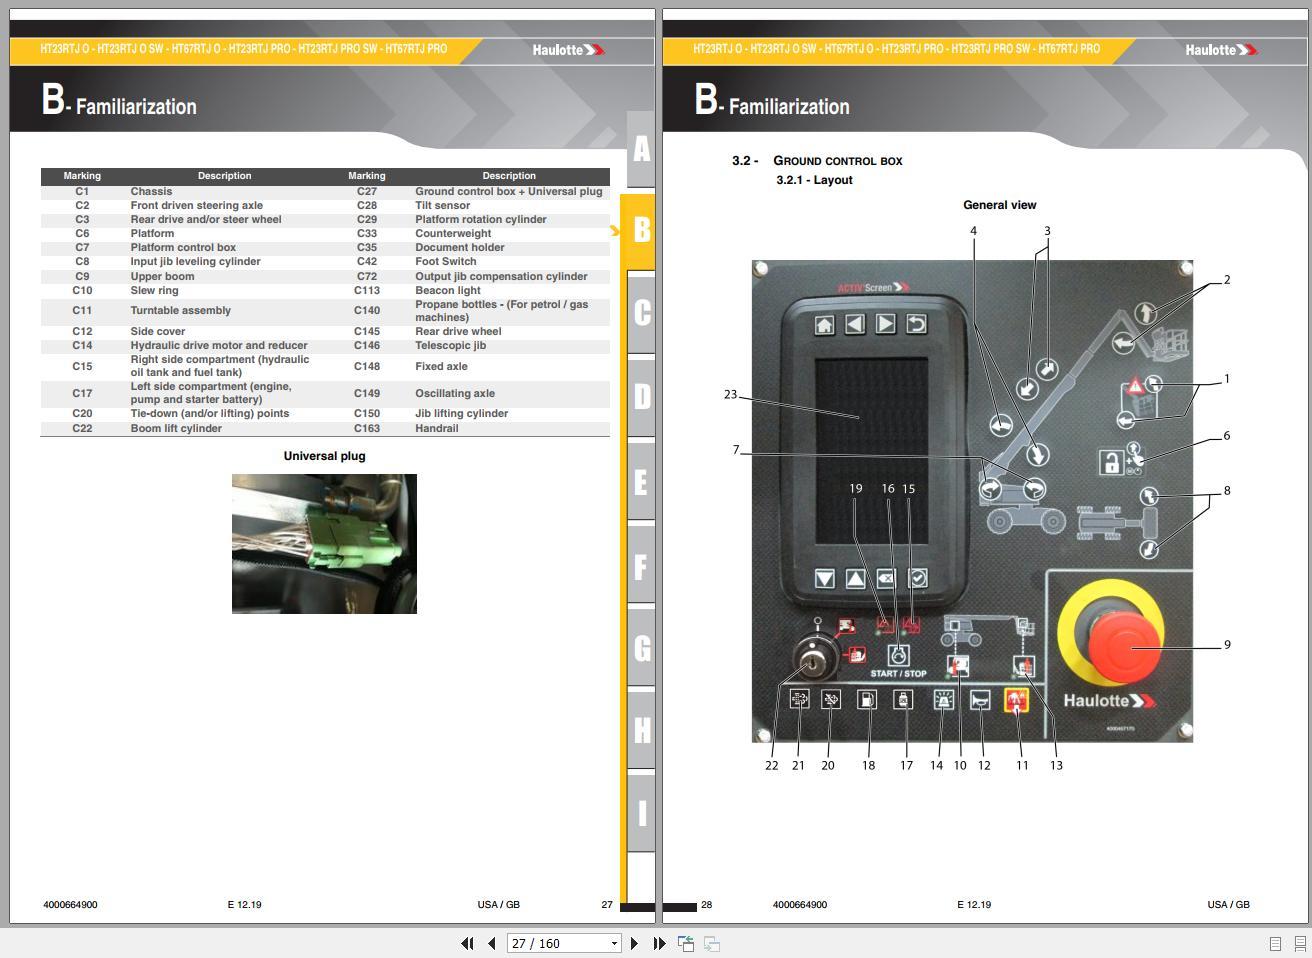 Haulotte_Work_Platforms_062020_Service_Maintenance_Operators_Manual_Training_Spare_Parts_Manual_DVD6